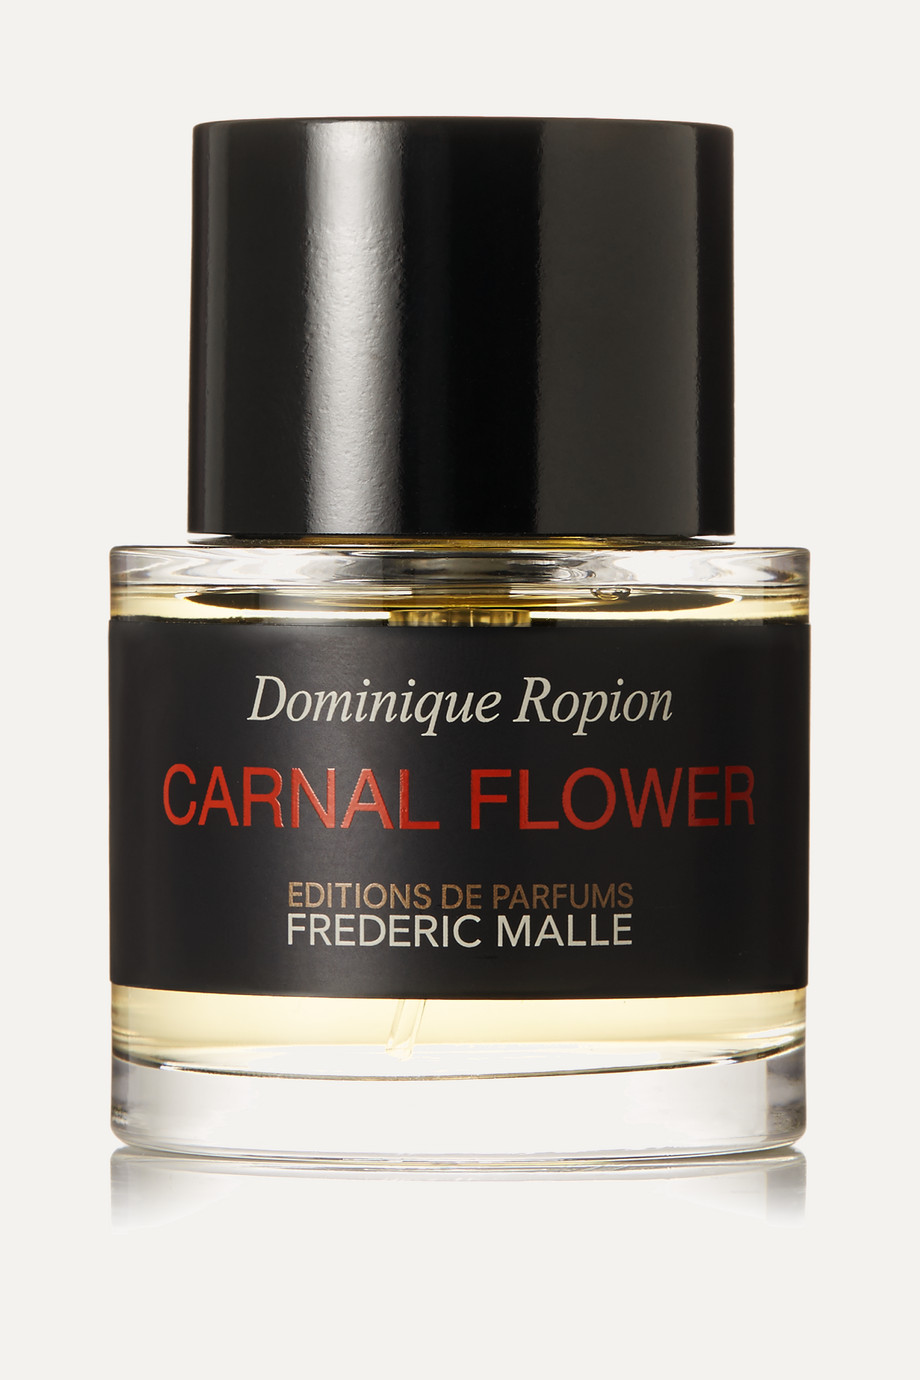 Frederic Malle Carnal Flower – Grüne Noten & Tuberose Absolue, 50 ml – Parfum